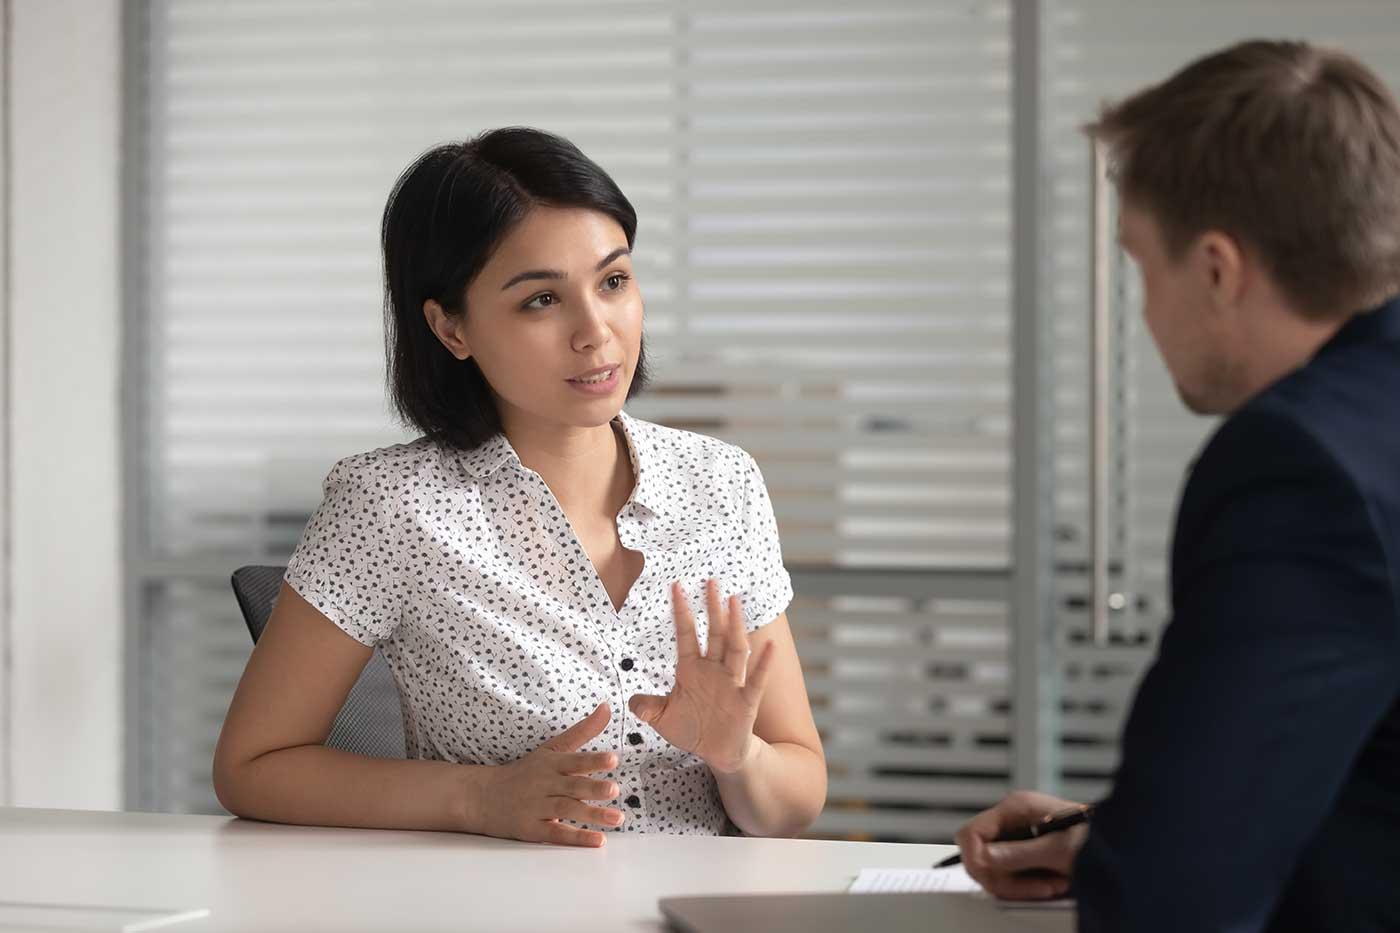 Kündigung – Infos, Tipps und rechtliche Fragen - BERATUNG.DE